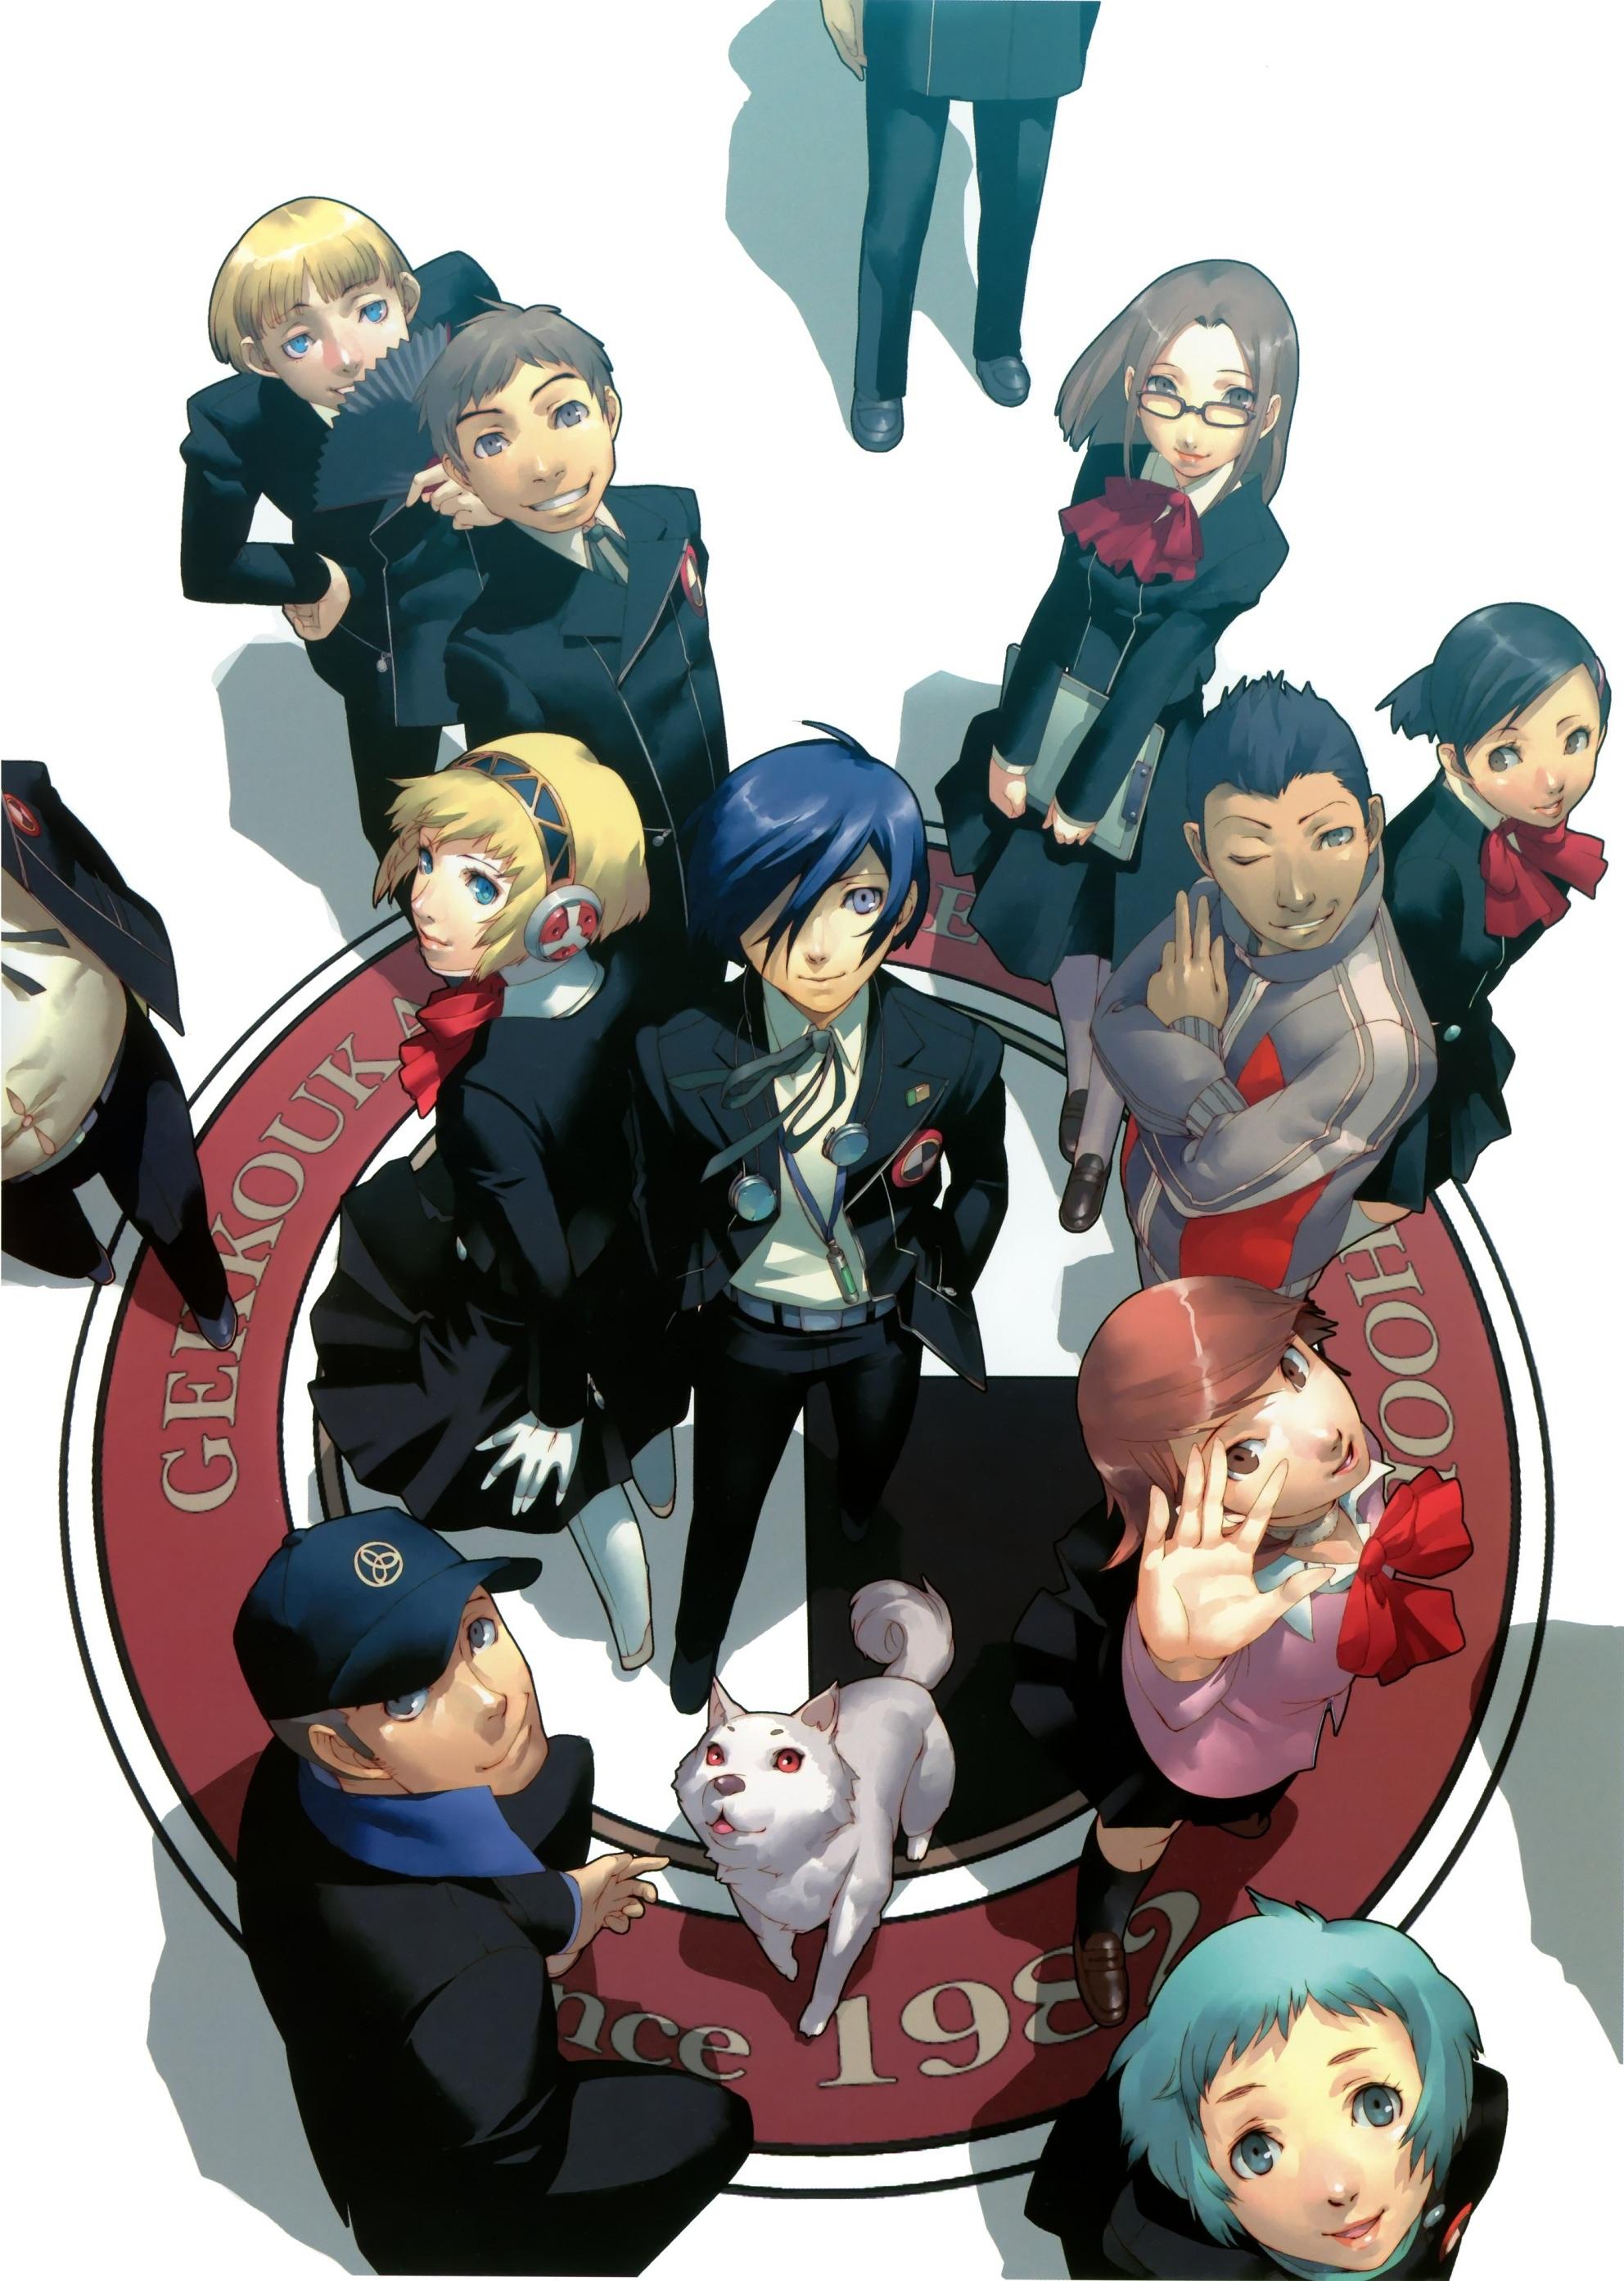 Image - Persona 3 FES artwork.jpg | Megami Tensei Wiki